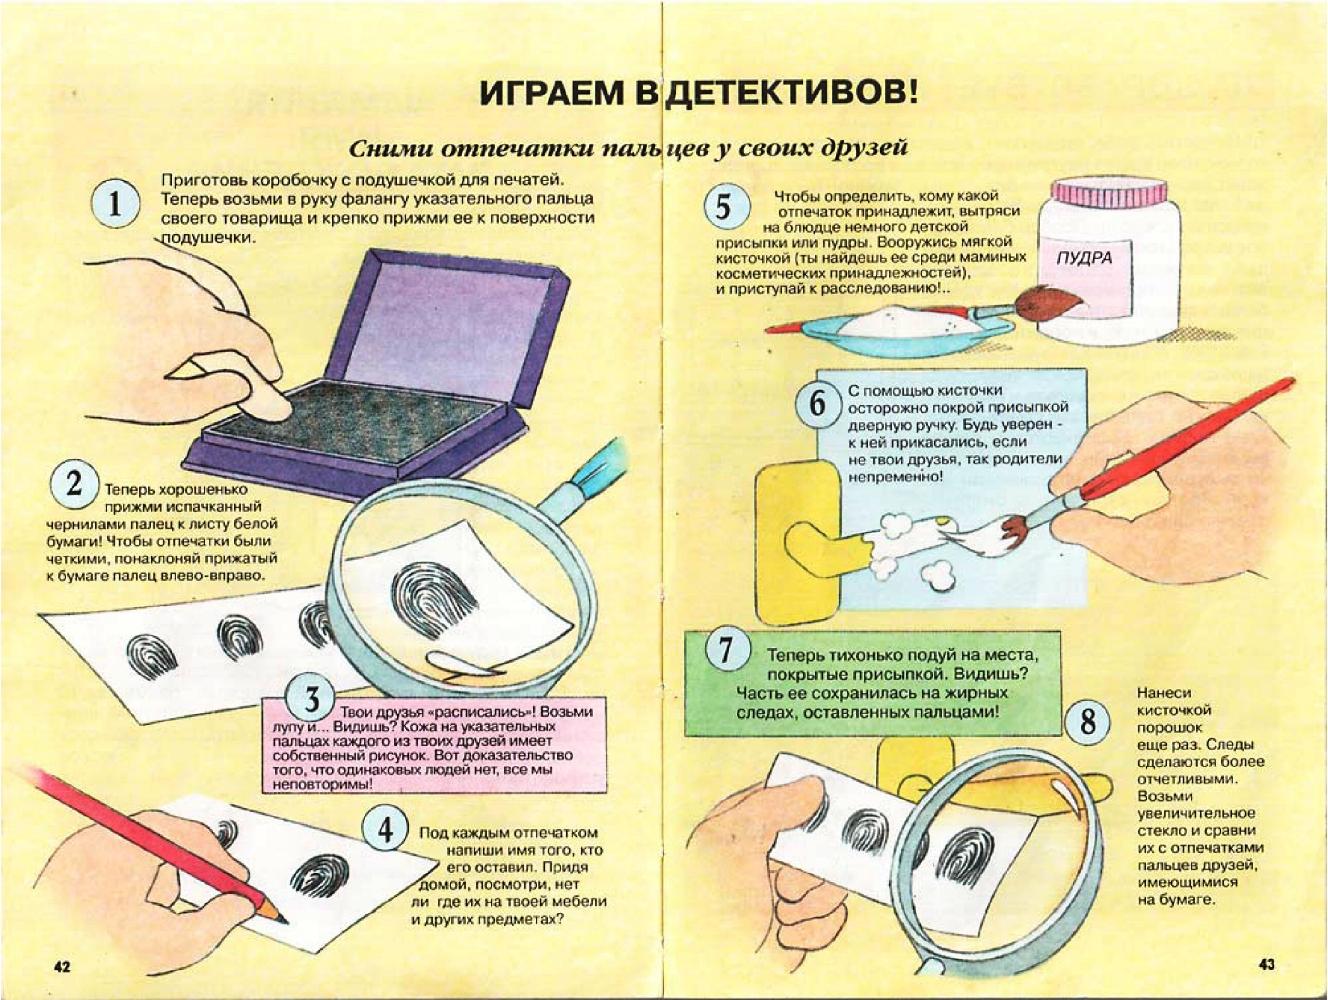 http://i6.imageban.ru/out/2013/12/06/7472ce1bb6bab65862cdd586e8bfc80e.jpg